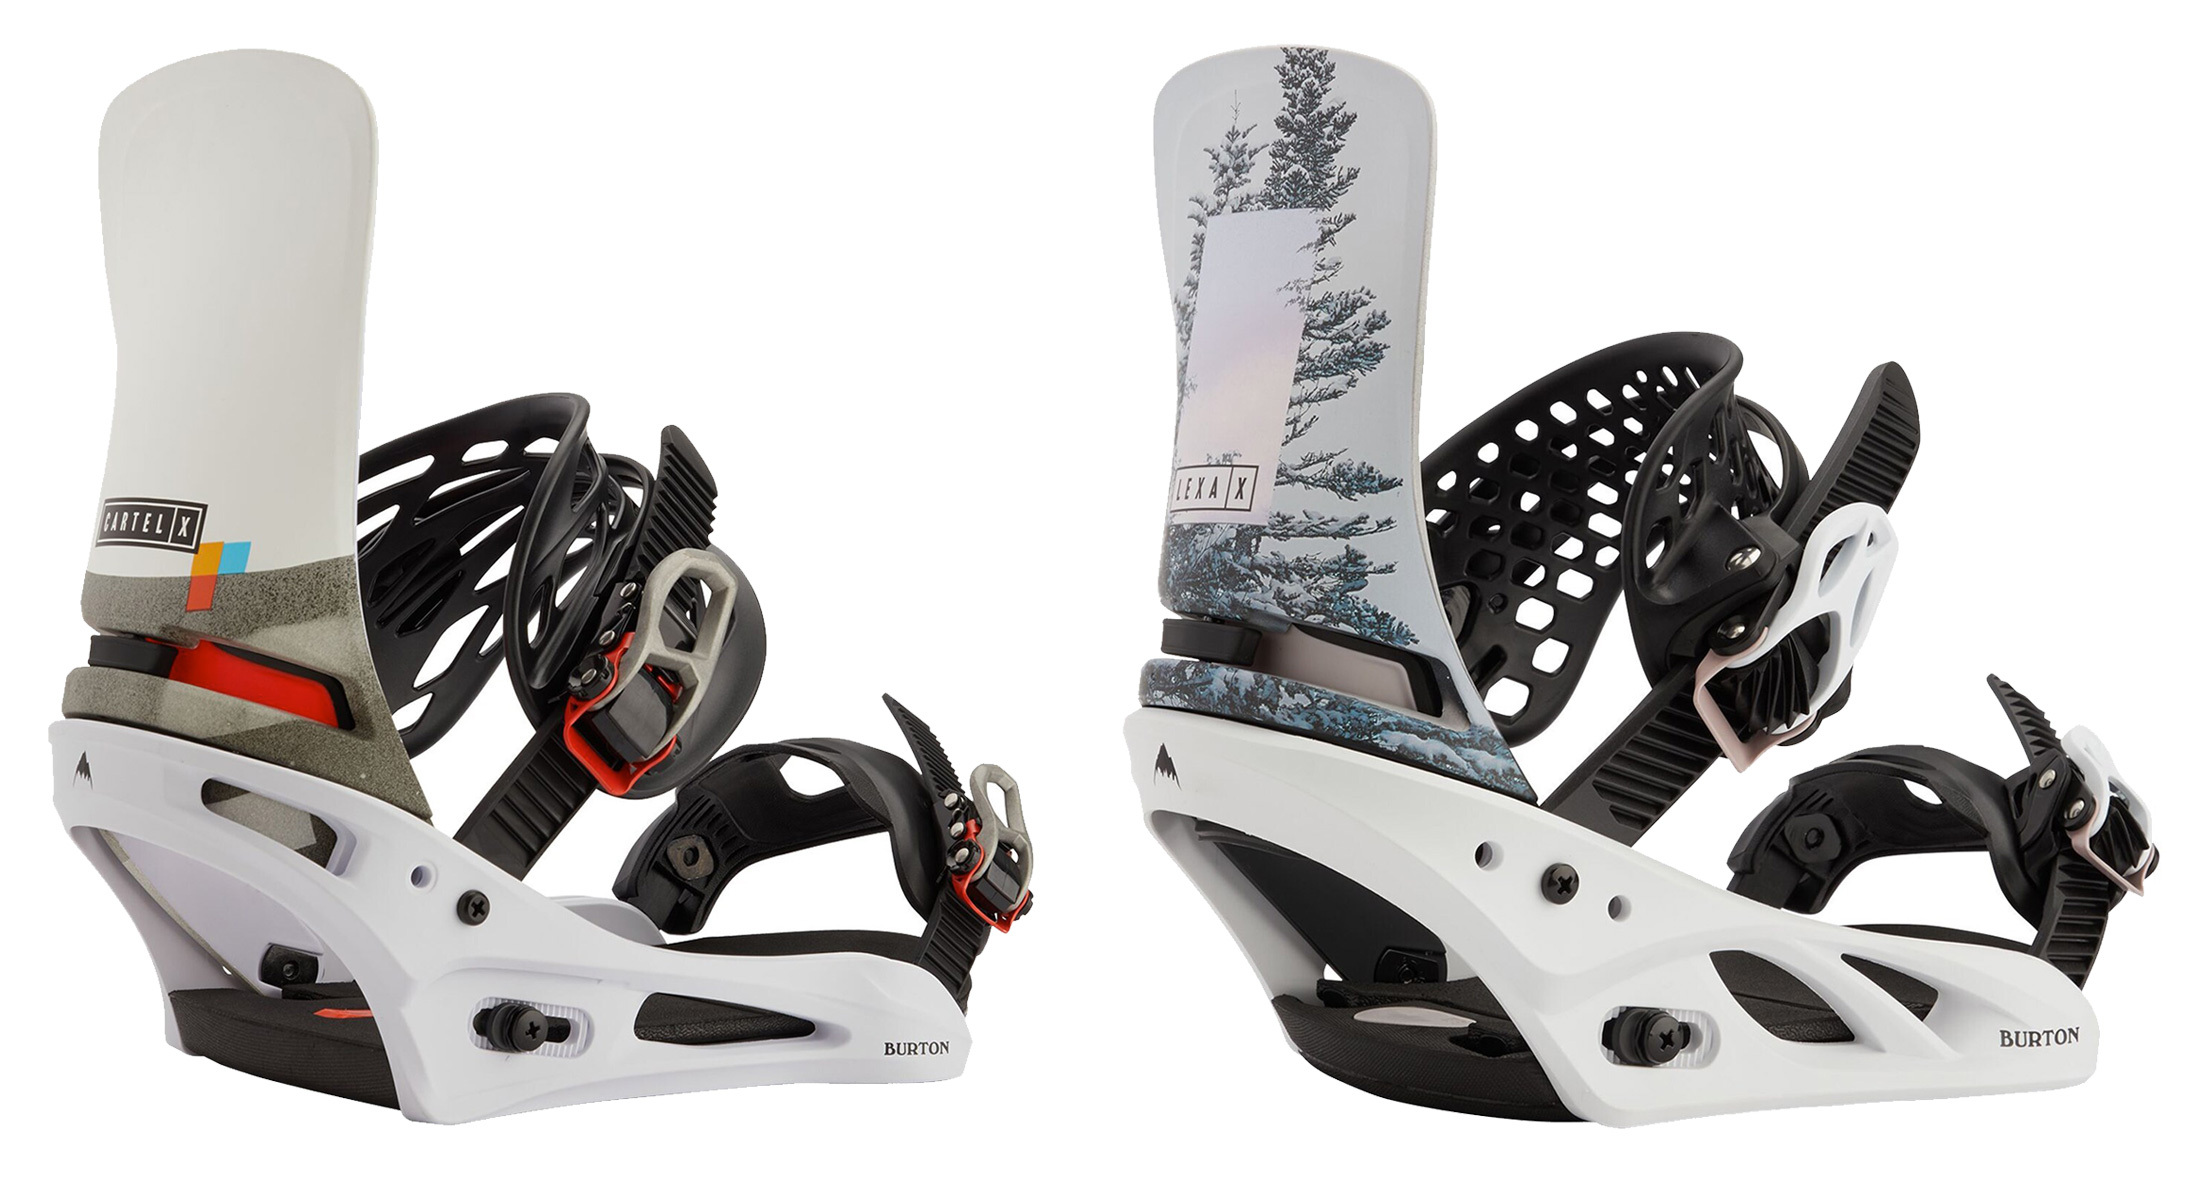 Burton Cartel and Lexa Snowboard Bindings